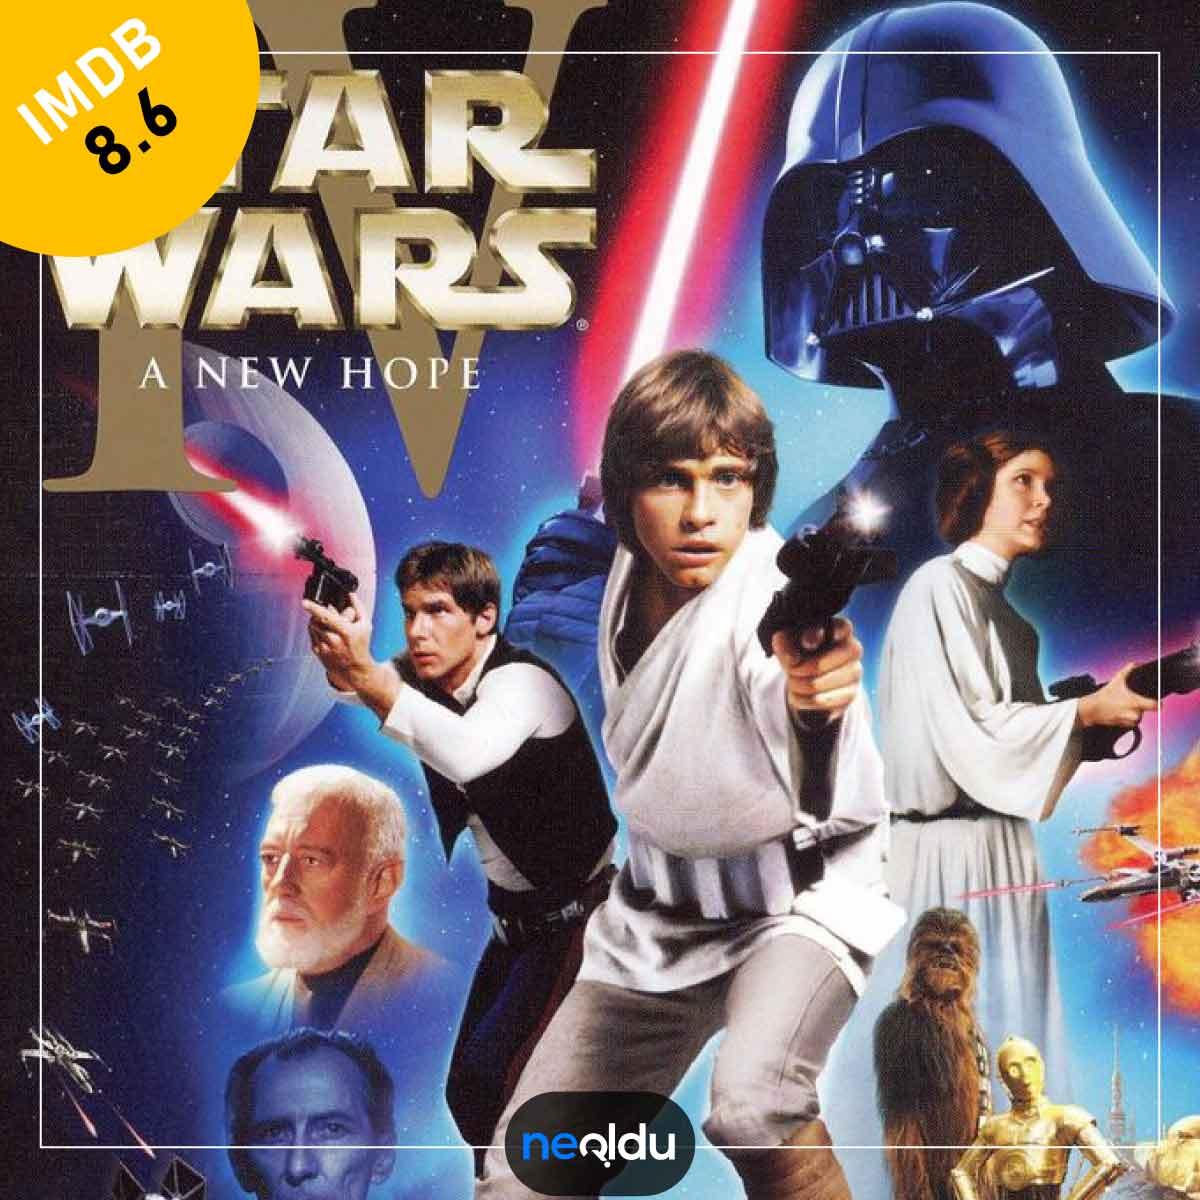 Star wars filmleri serisi